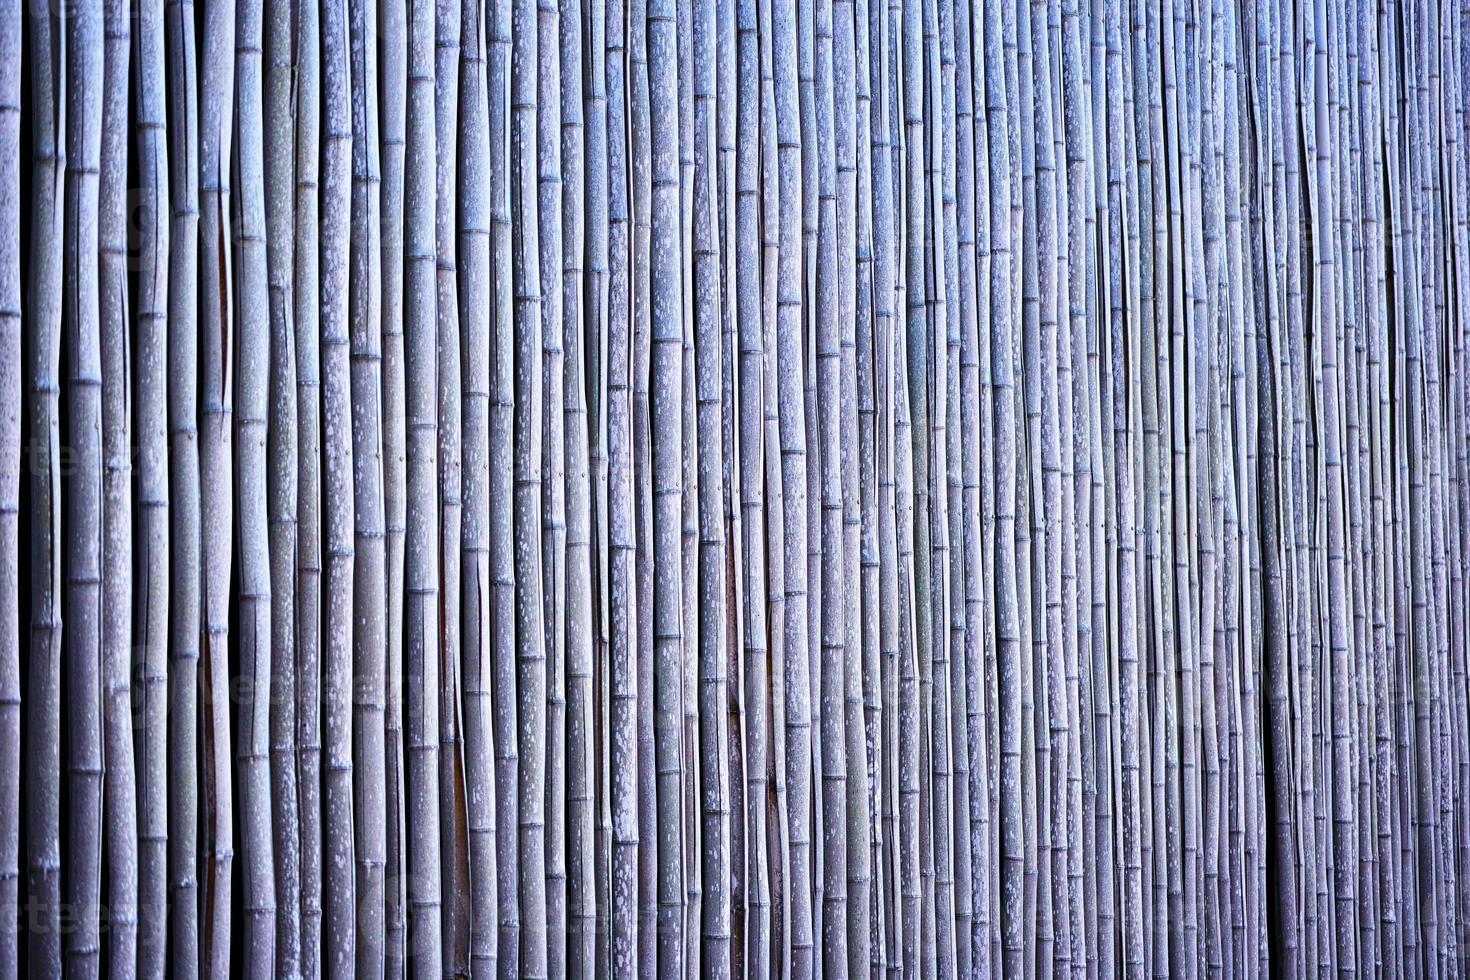 valla de bambú foto